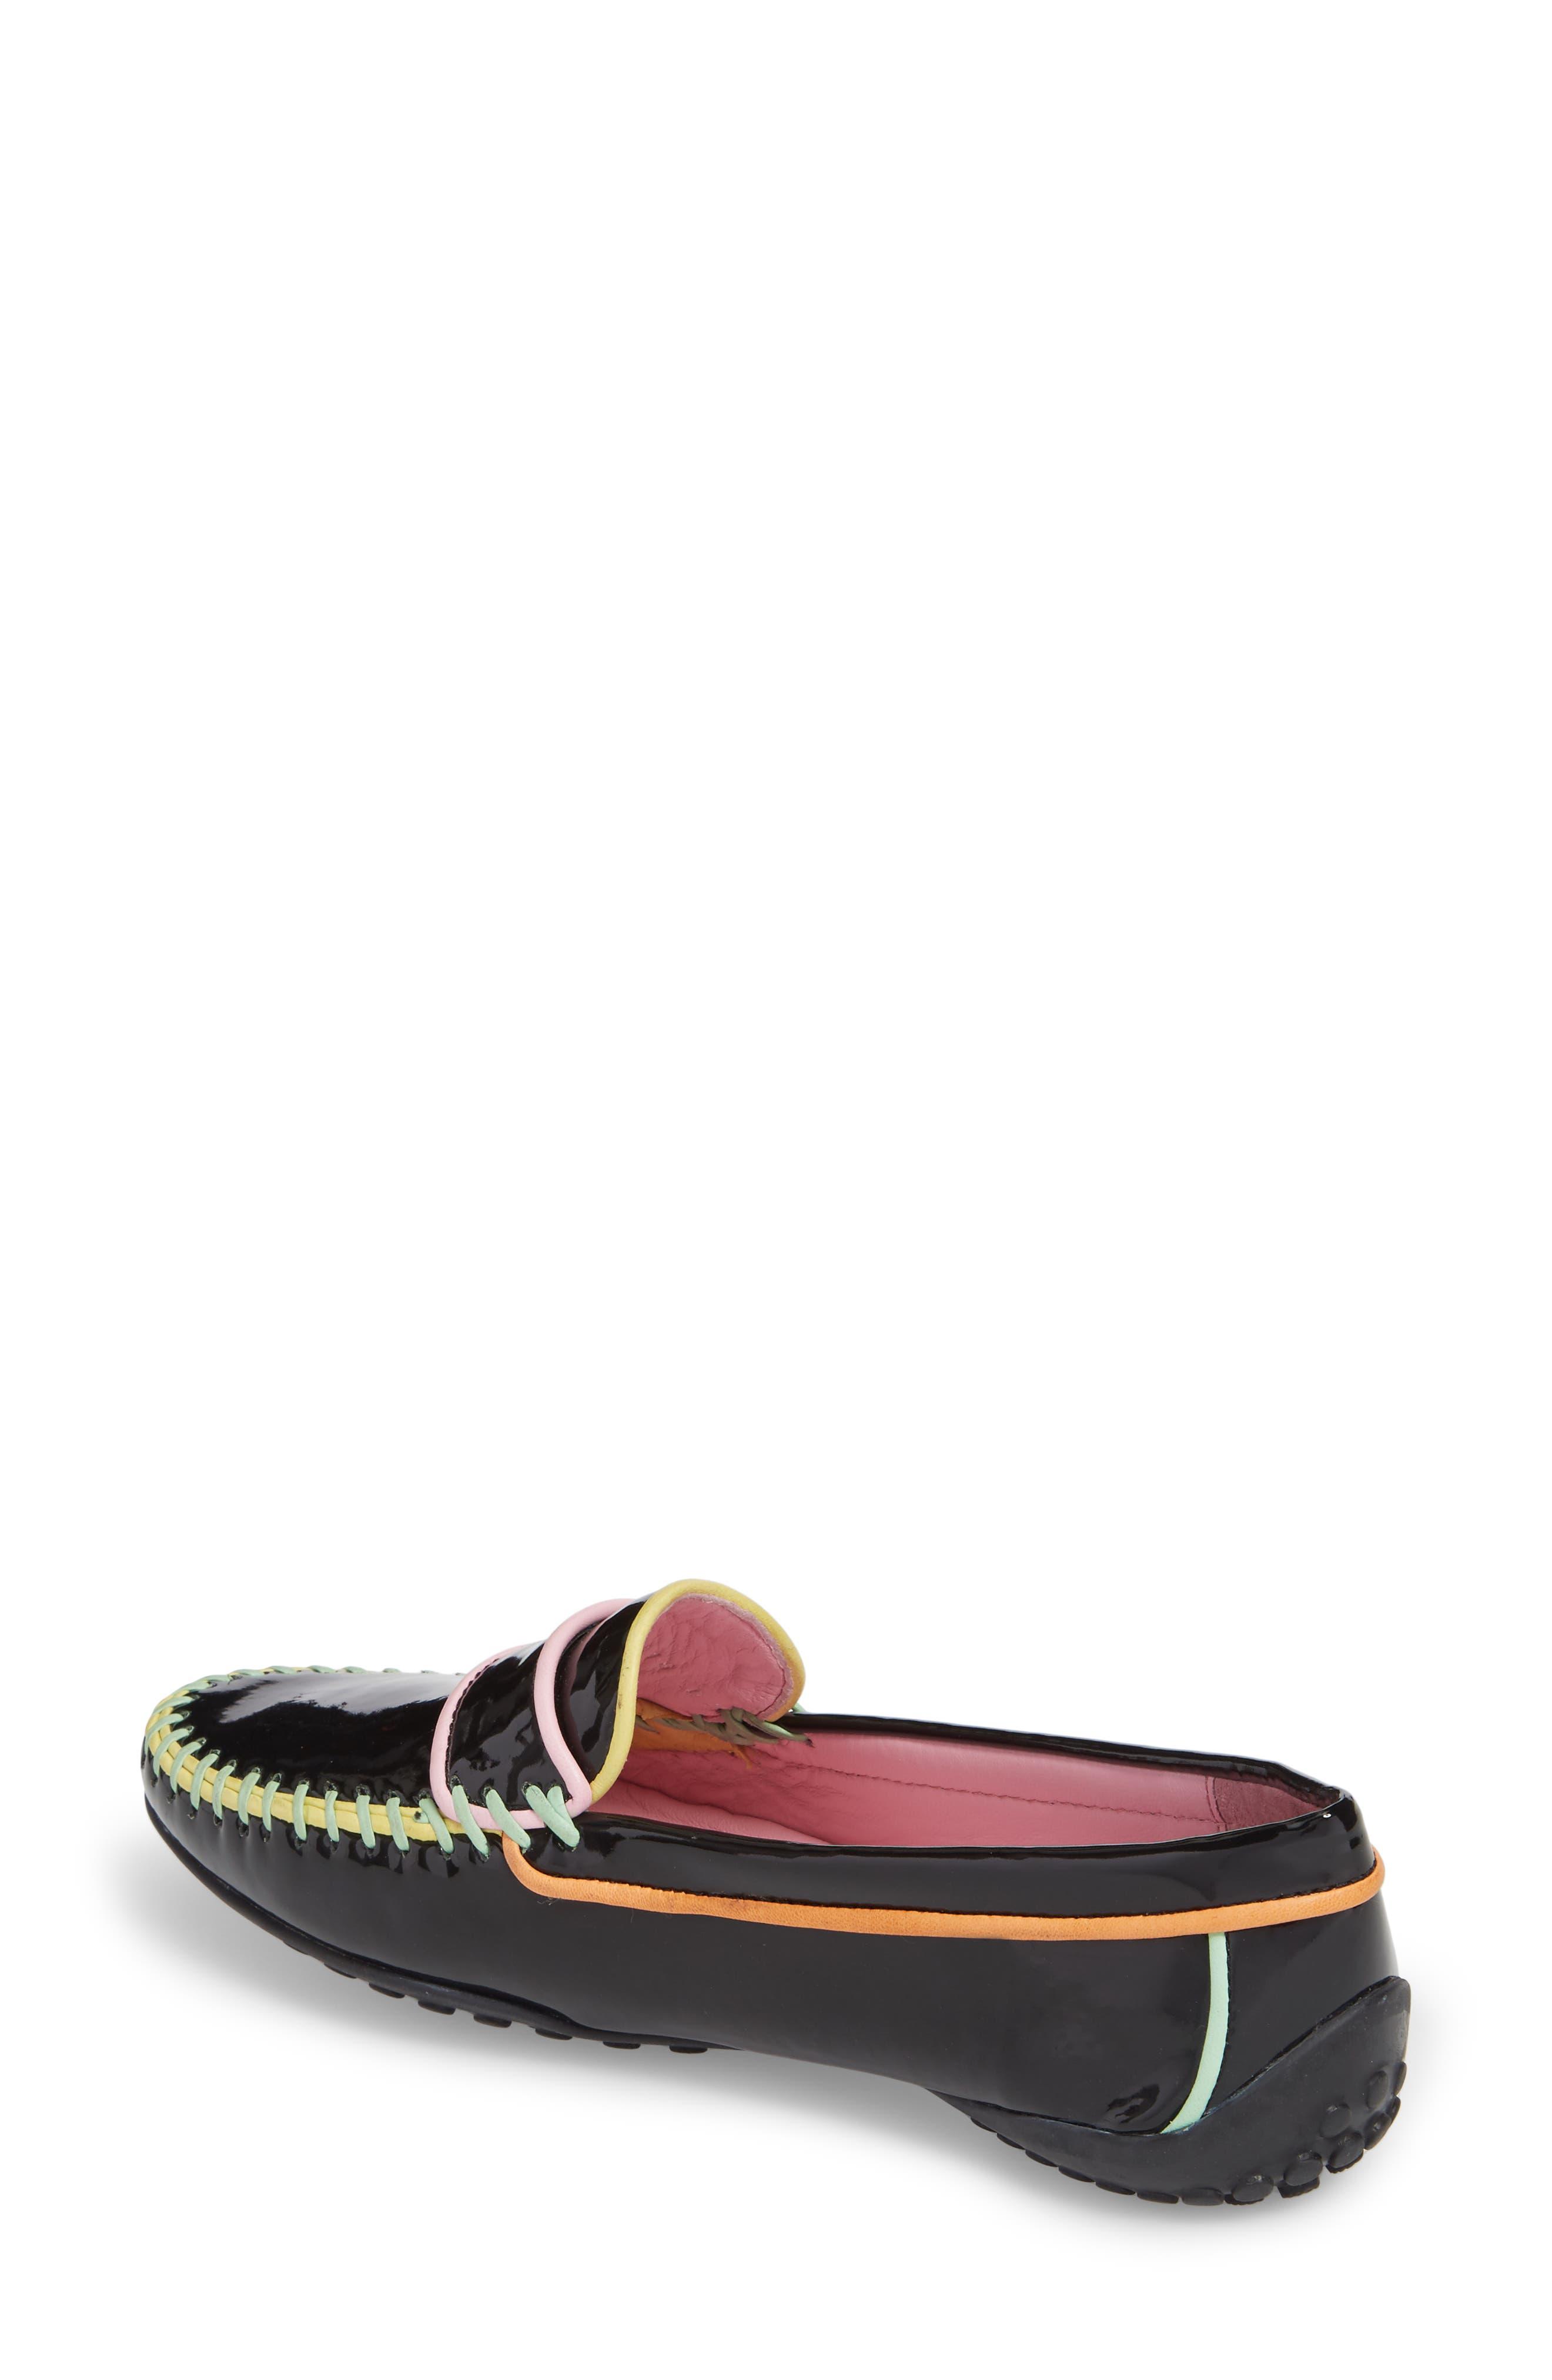 Moccasin Loafer,                             Alternate thumbnail 2, color,                             003